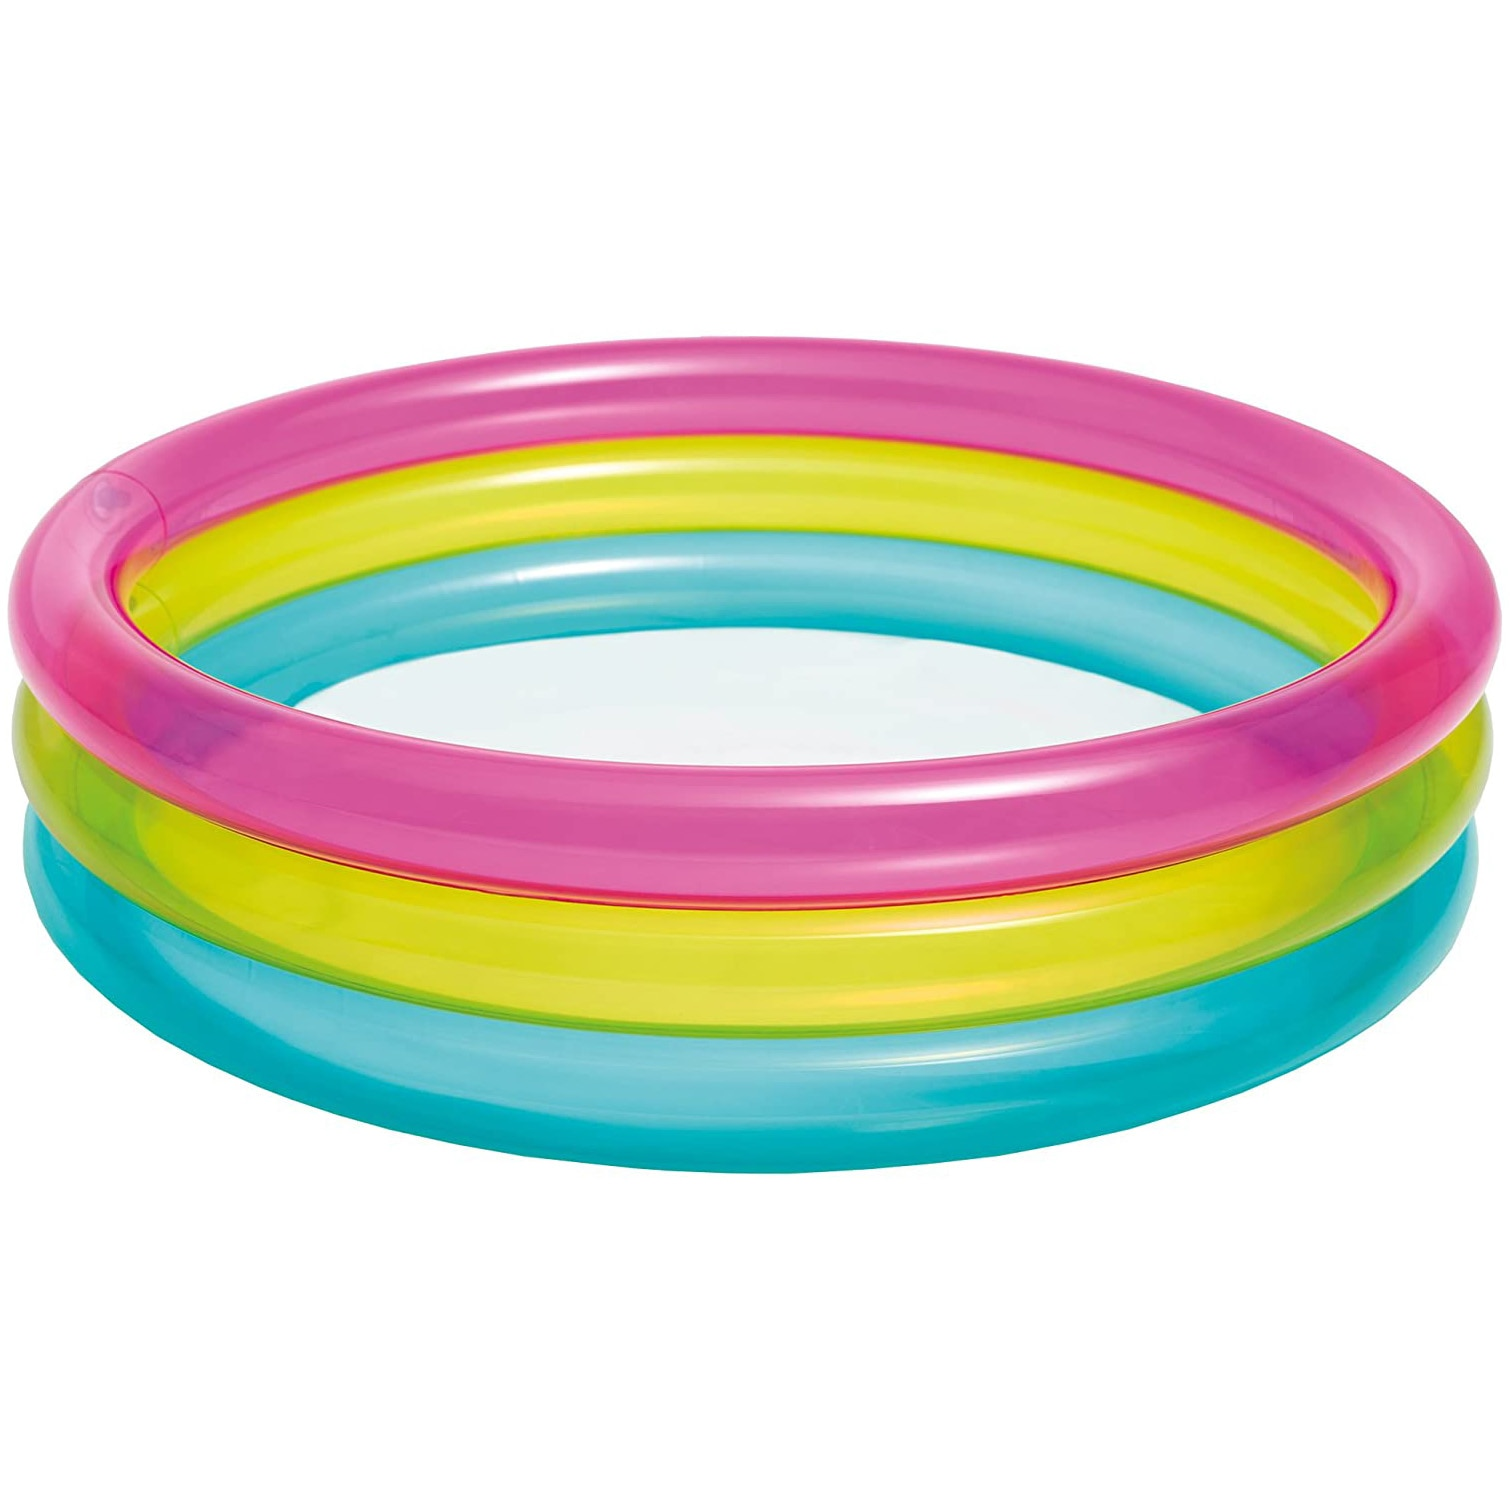 Fotografie Piscina gonflabila Intex - Rainbow baby pool, cu 3 inele, 86 x 25 cm